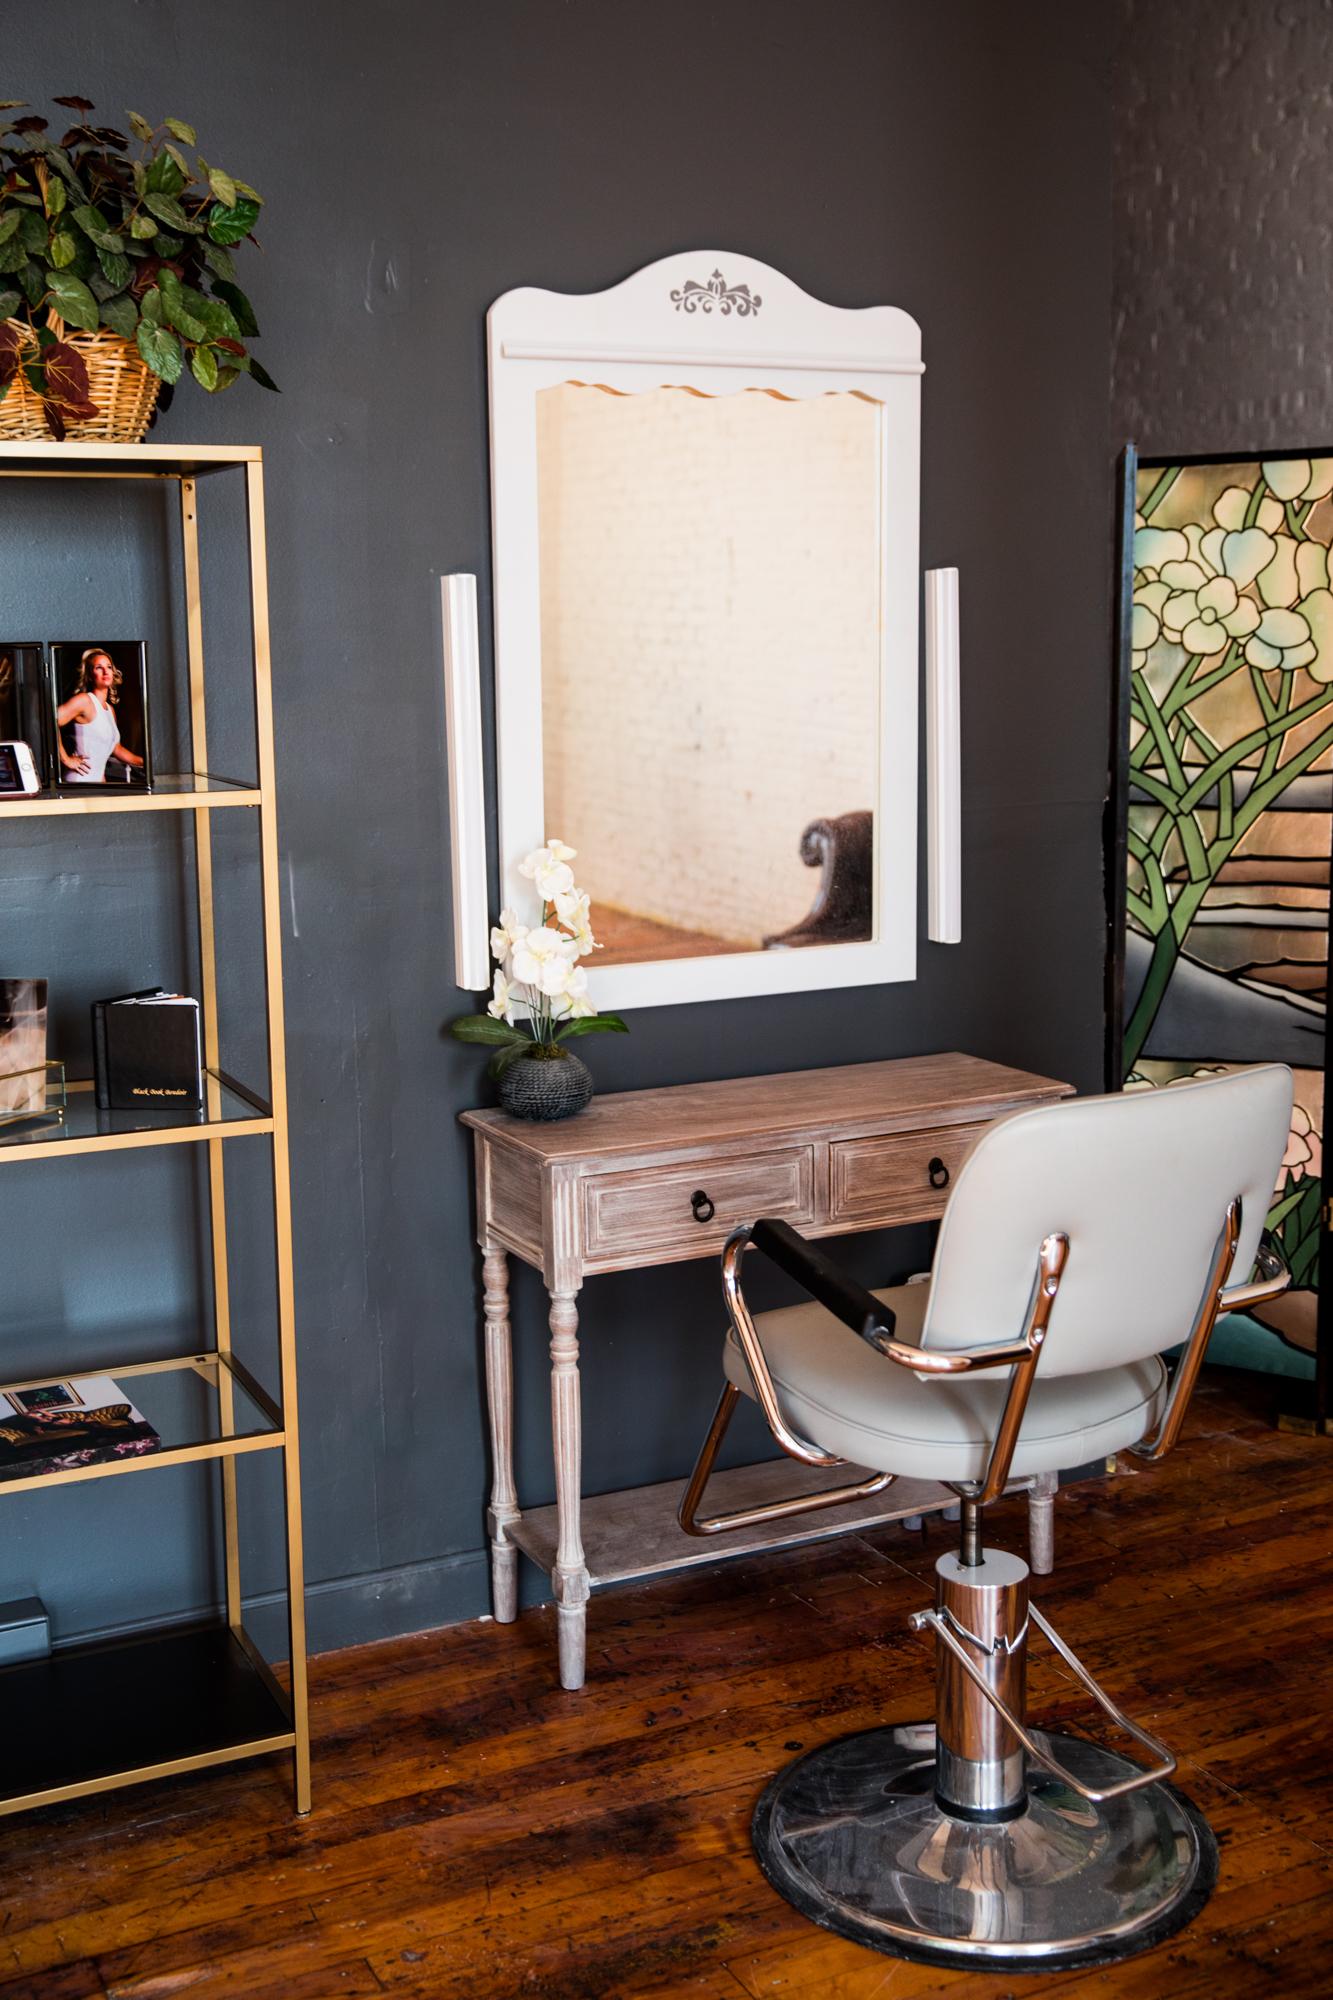 hair-and-makeup-Worcester-boudoir-studio-Photography-ideas-Photographer-BlackBookStudio-95.jpg